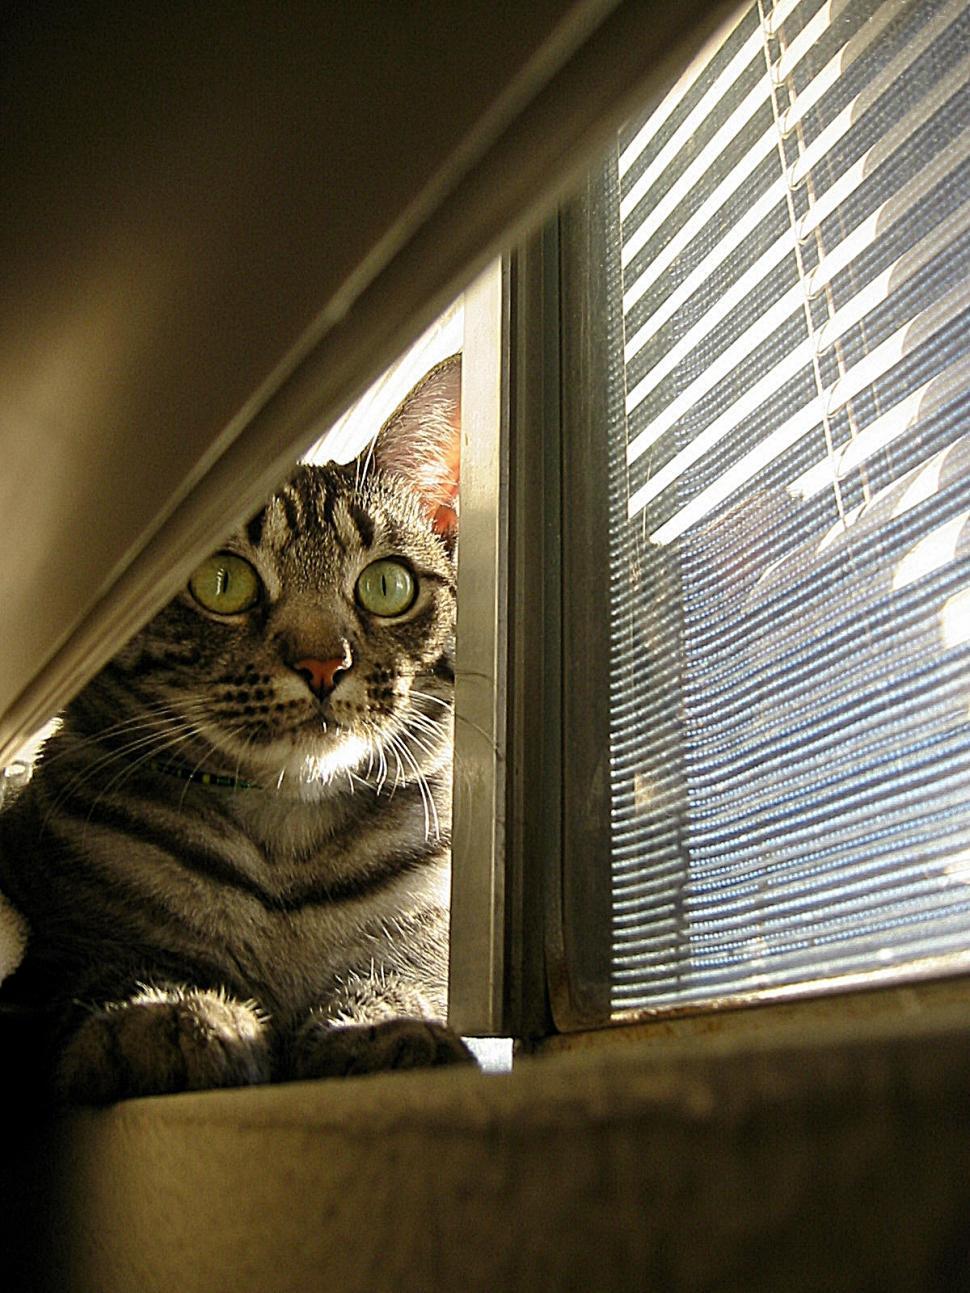 Download Free Stock HD Photo of Cat in Window Online